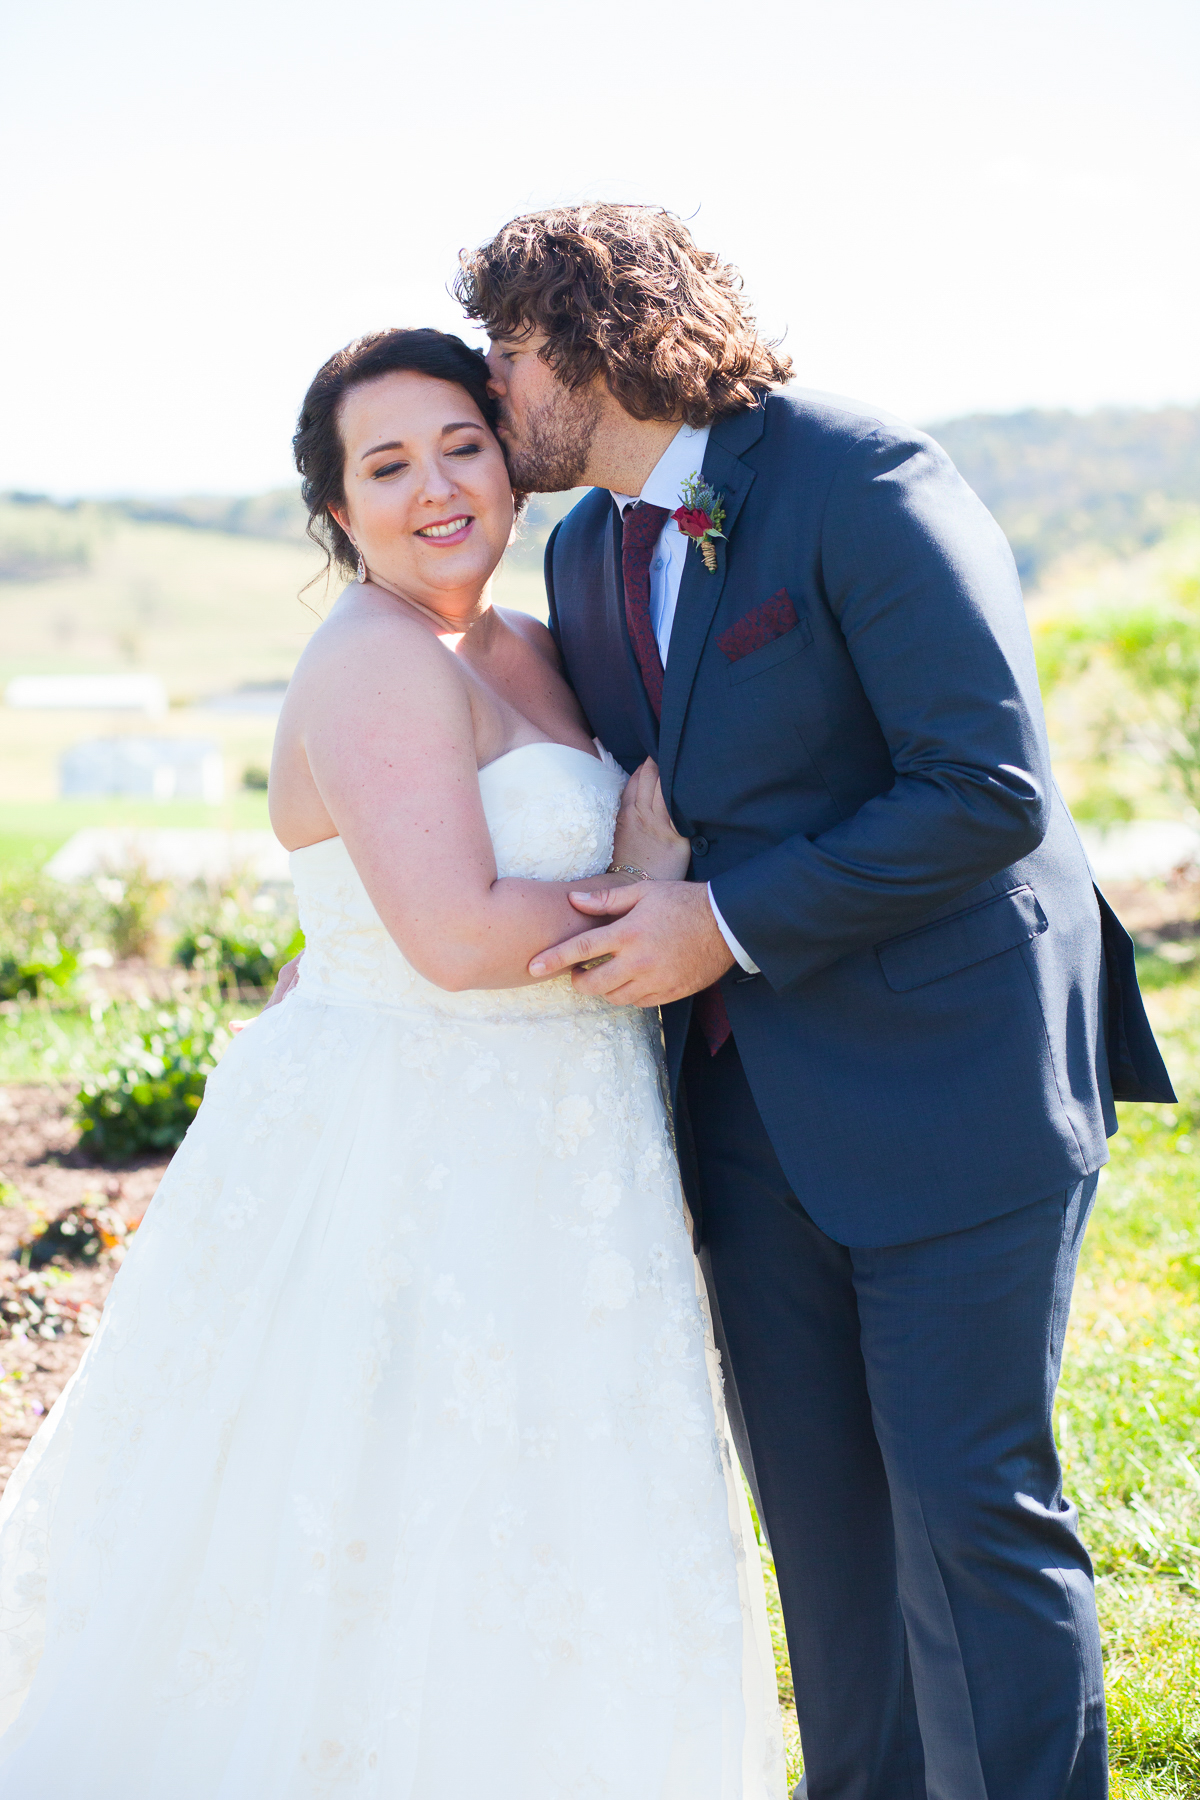 Mary + Patrick Wedding On Sunny Slope Farm Wedding Venue by Feather & Oak Photography (11 of 31)